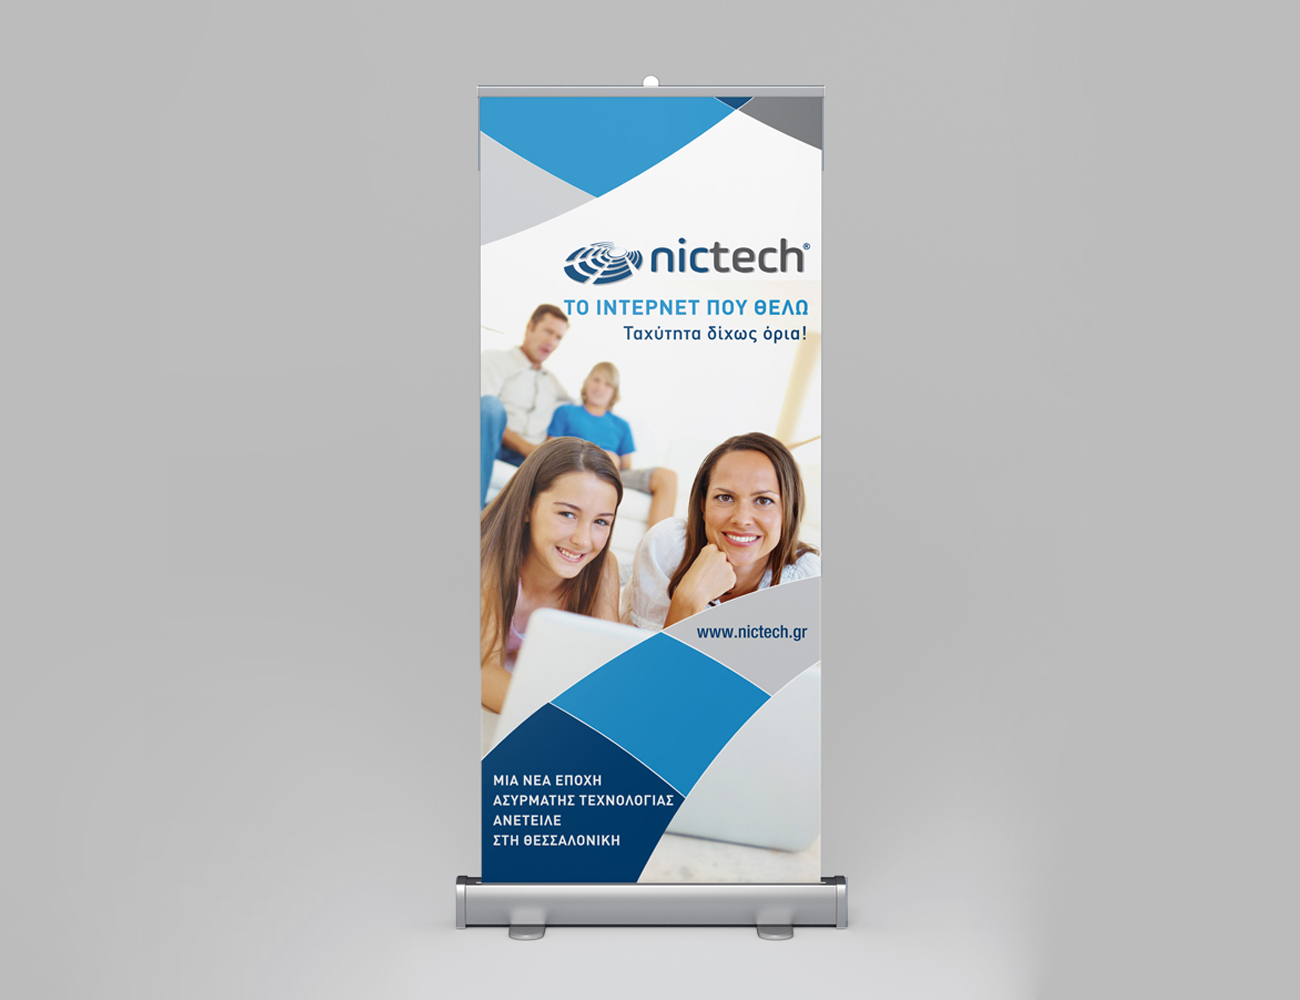 nictechbannerdesign